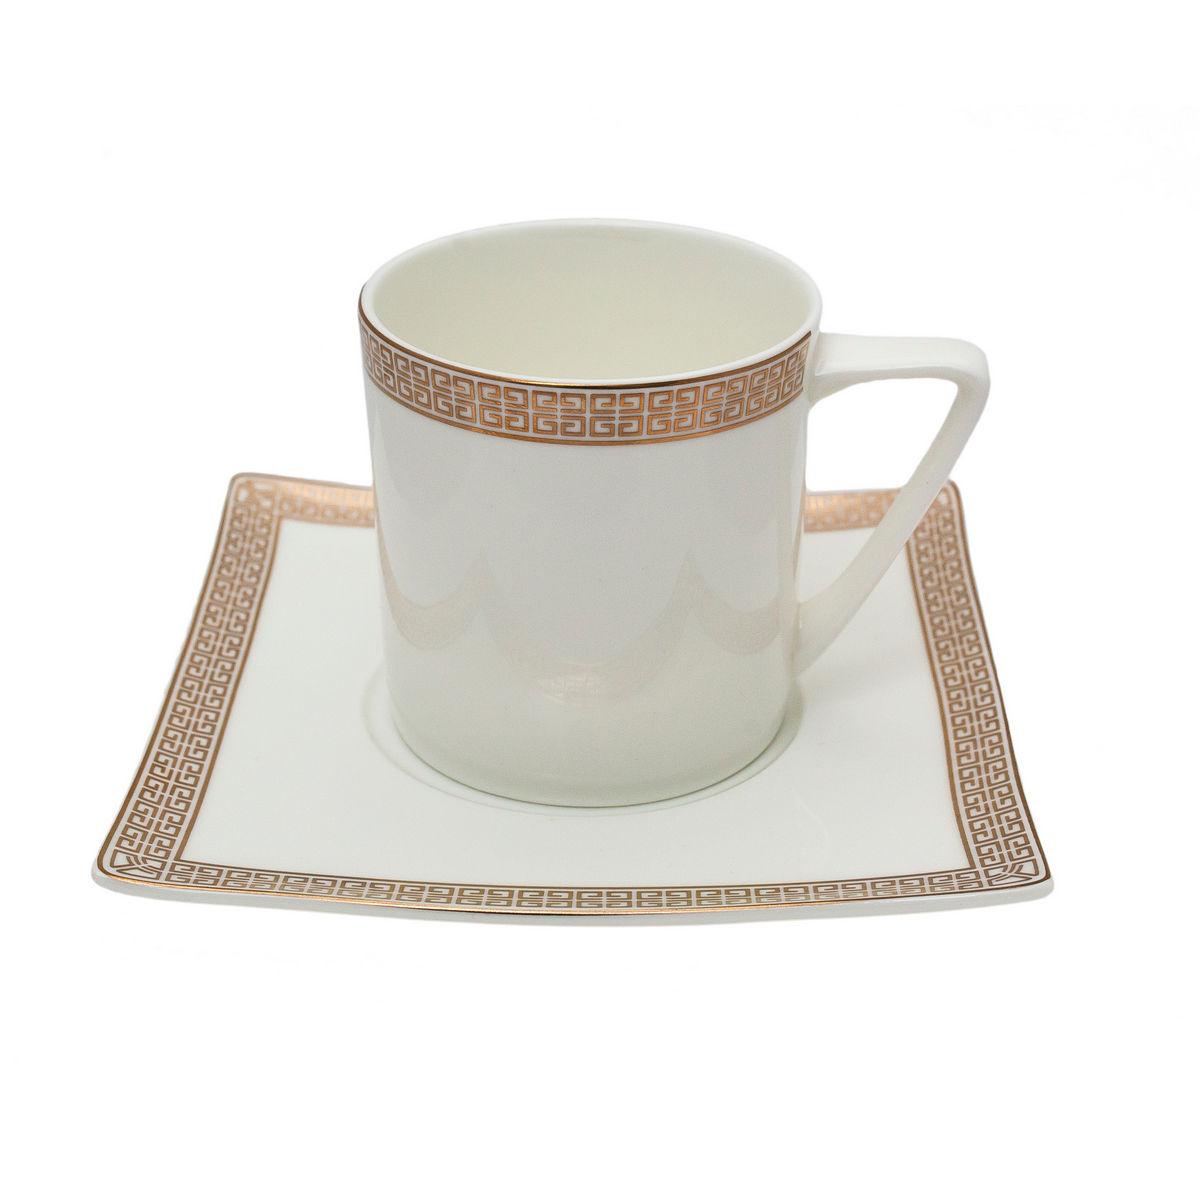 ELECTRA Serviciu ceai portelan 6 persoane 220 ml